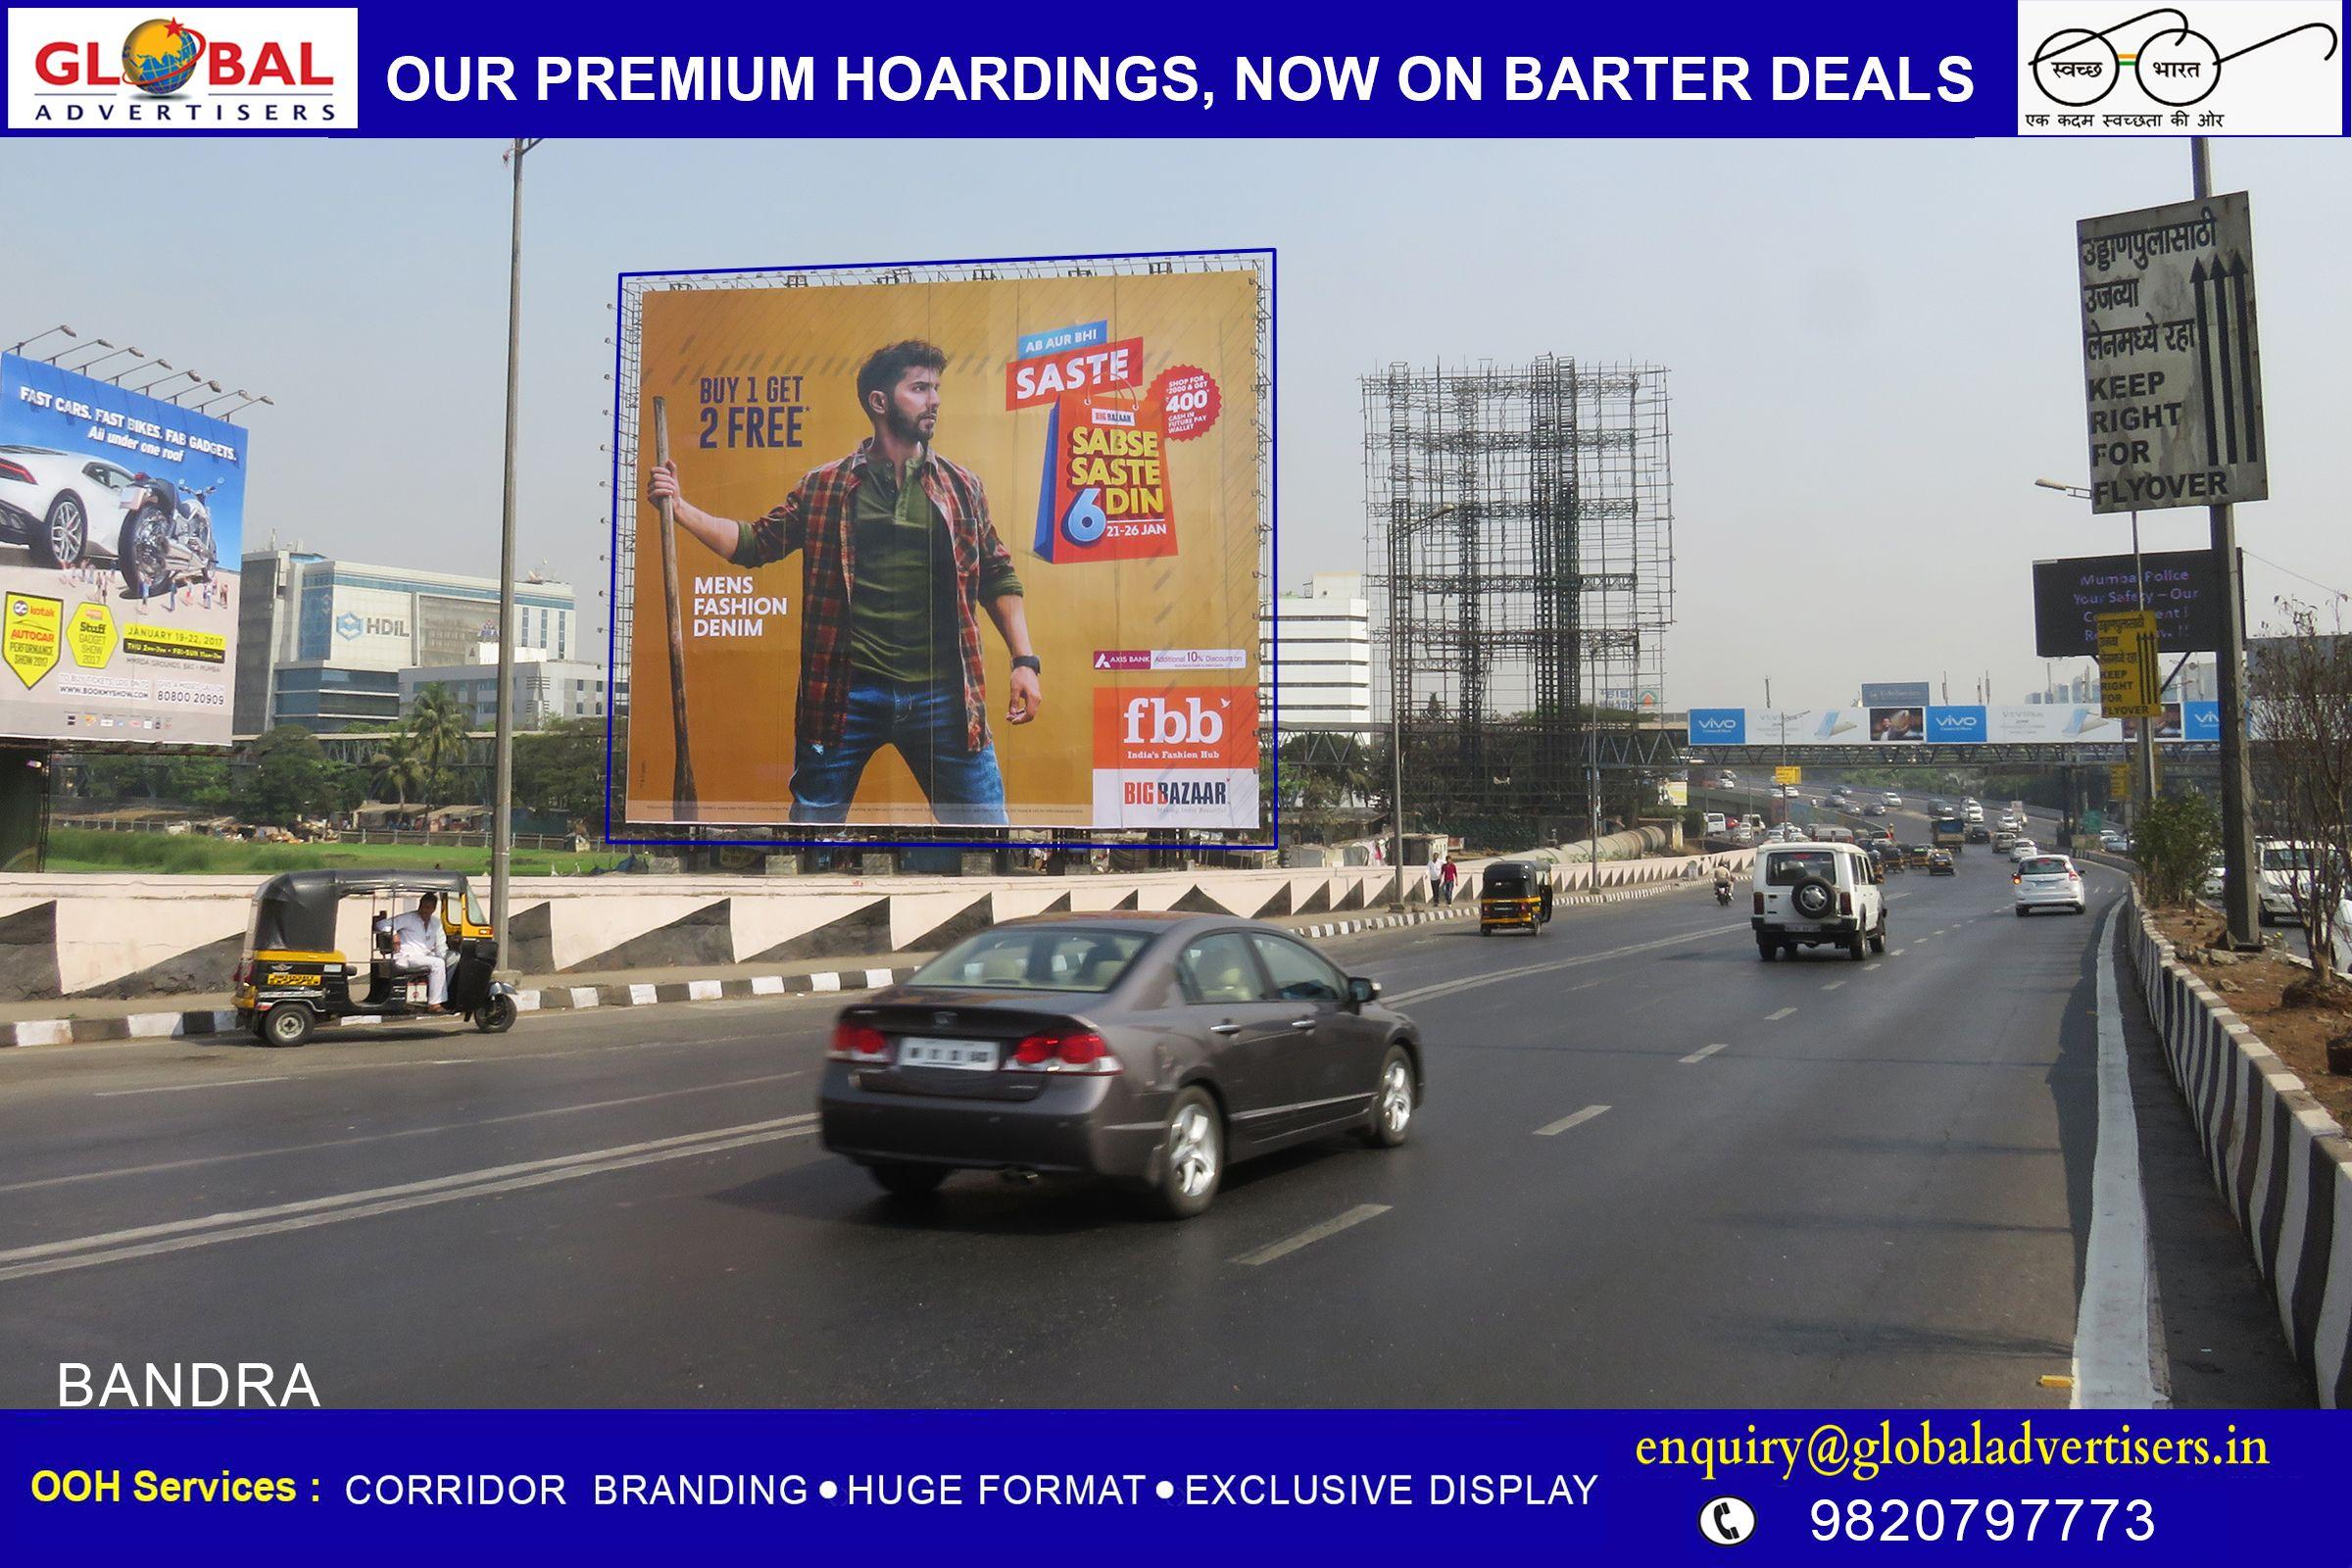 308d814062b Global Advertisers Showcases Fbb - India s Fashion Hub Big Bazaar on Asia s  Largest Hoarding.  Asia sLargestHoarding  OOHMedia  OutdoorPrormotion